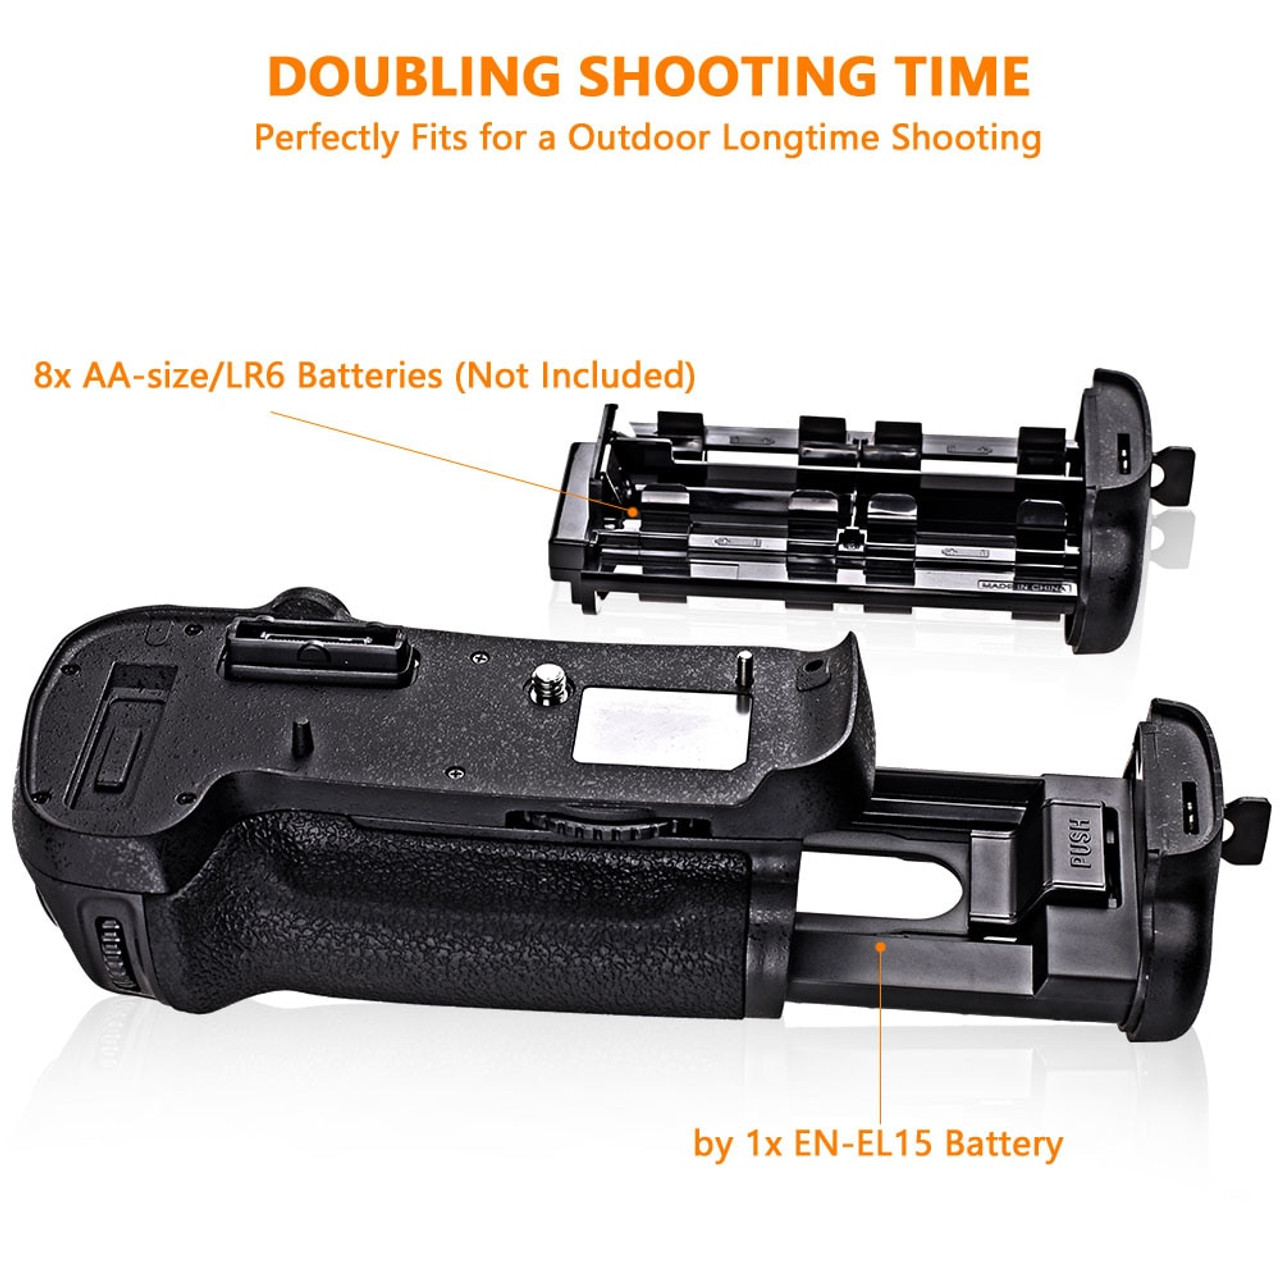 PIXEL MB-D12 Battery Grip for Nikon DSLR Digital Cameras D800 D800E D810 Replacement Nikon MB-D12